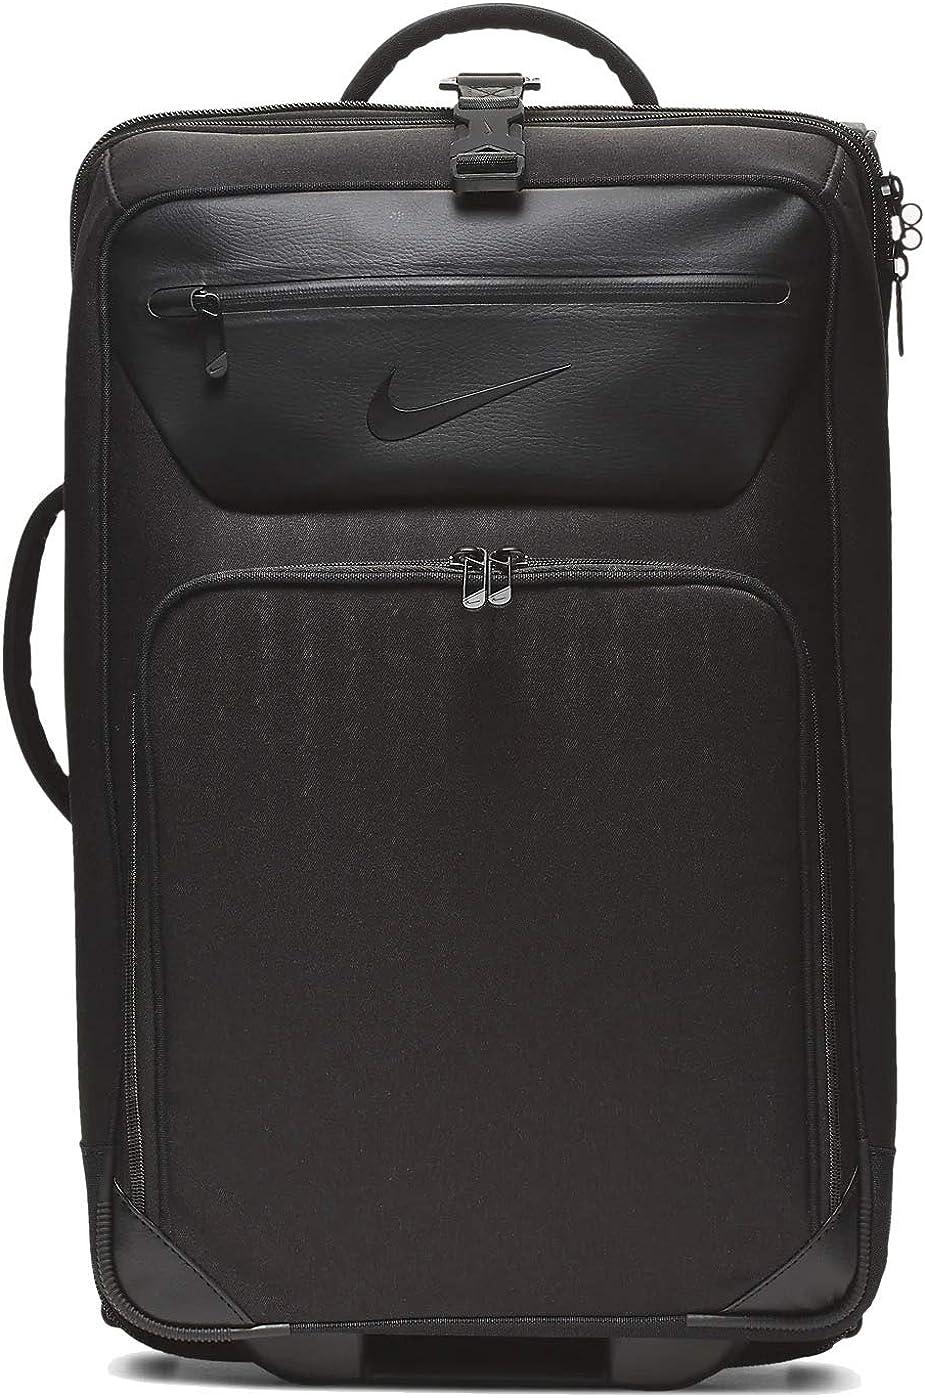 Nike Departure Roller Bag Ba5926-010